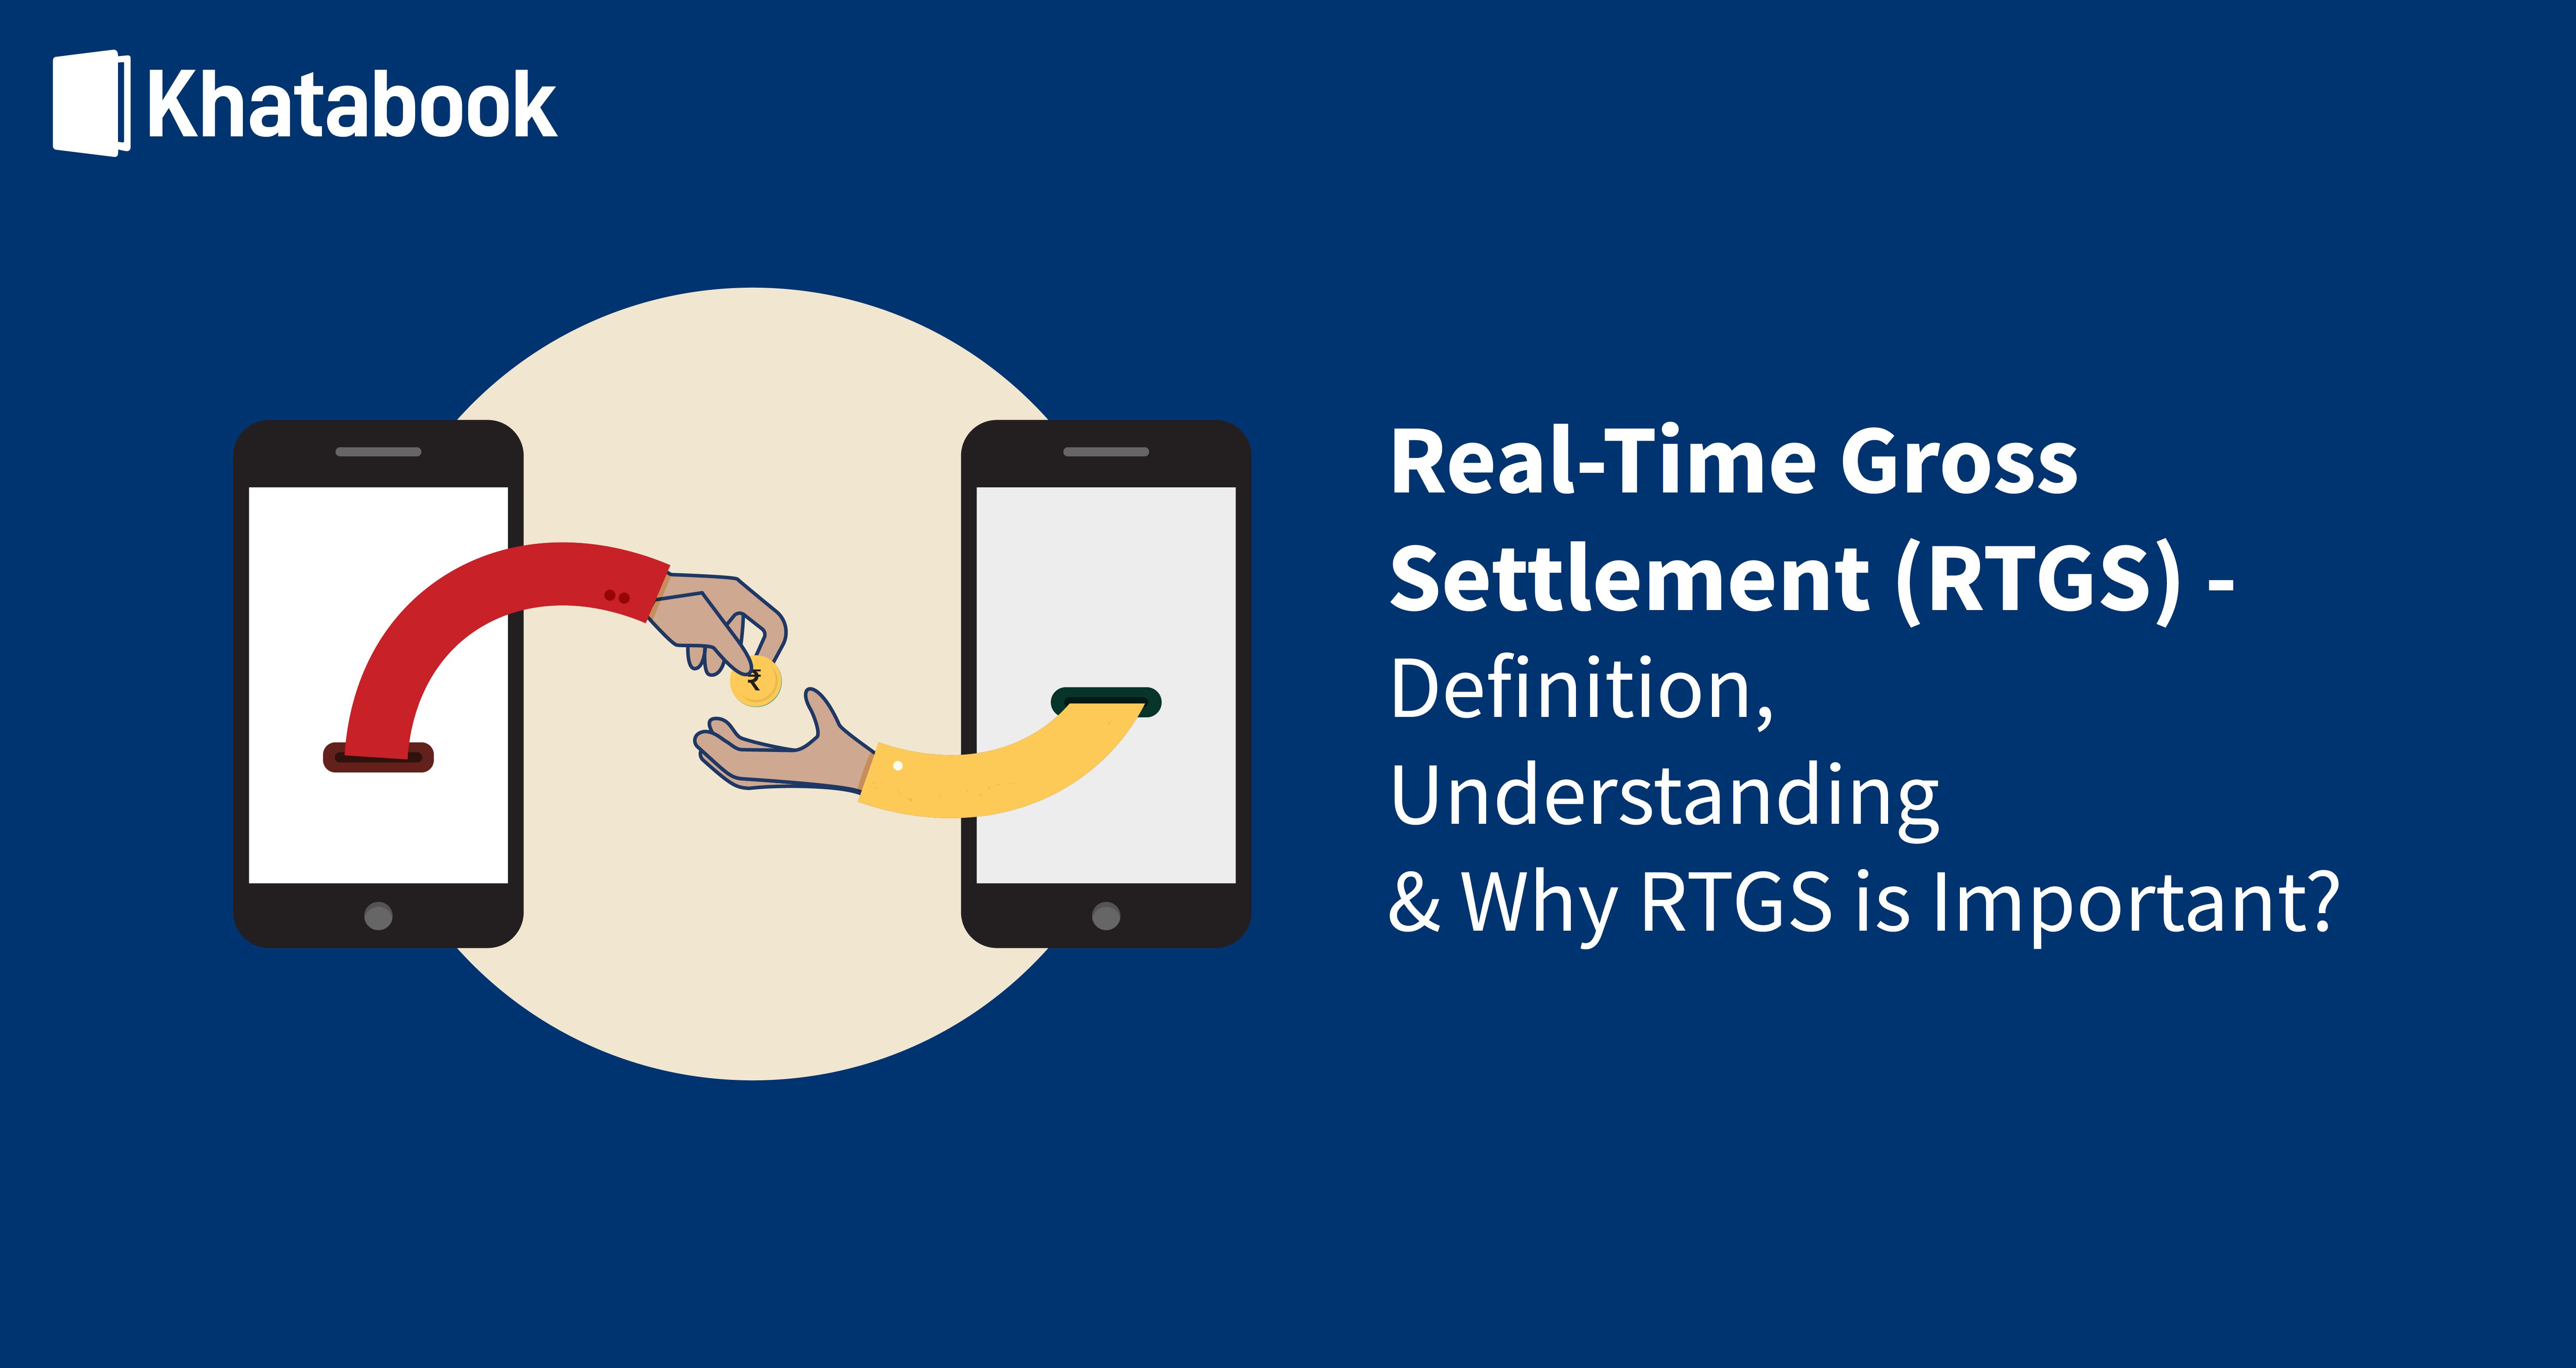 Real-Time Gross Settlement (RTGS)- Definition & Importance